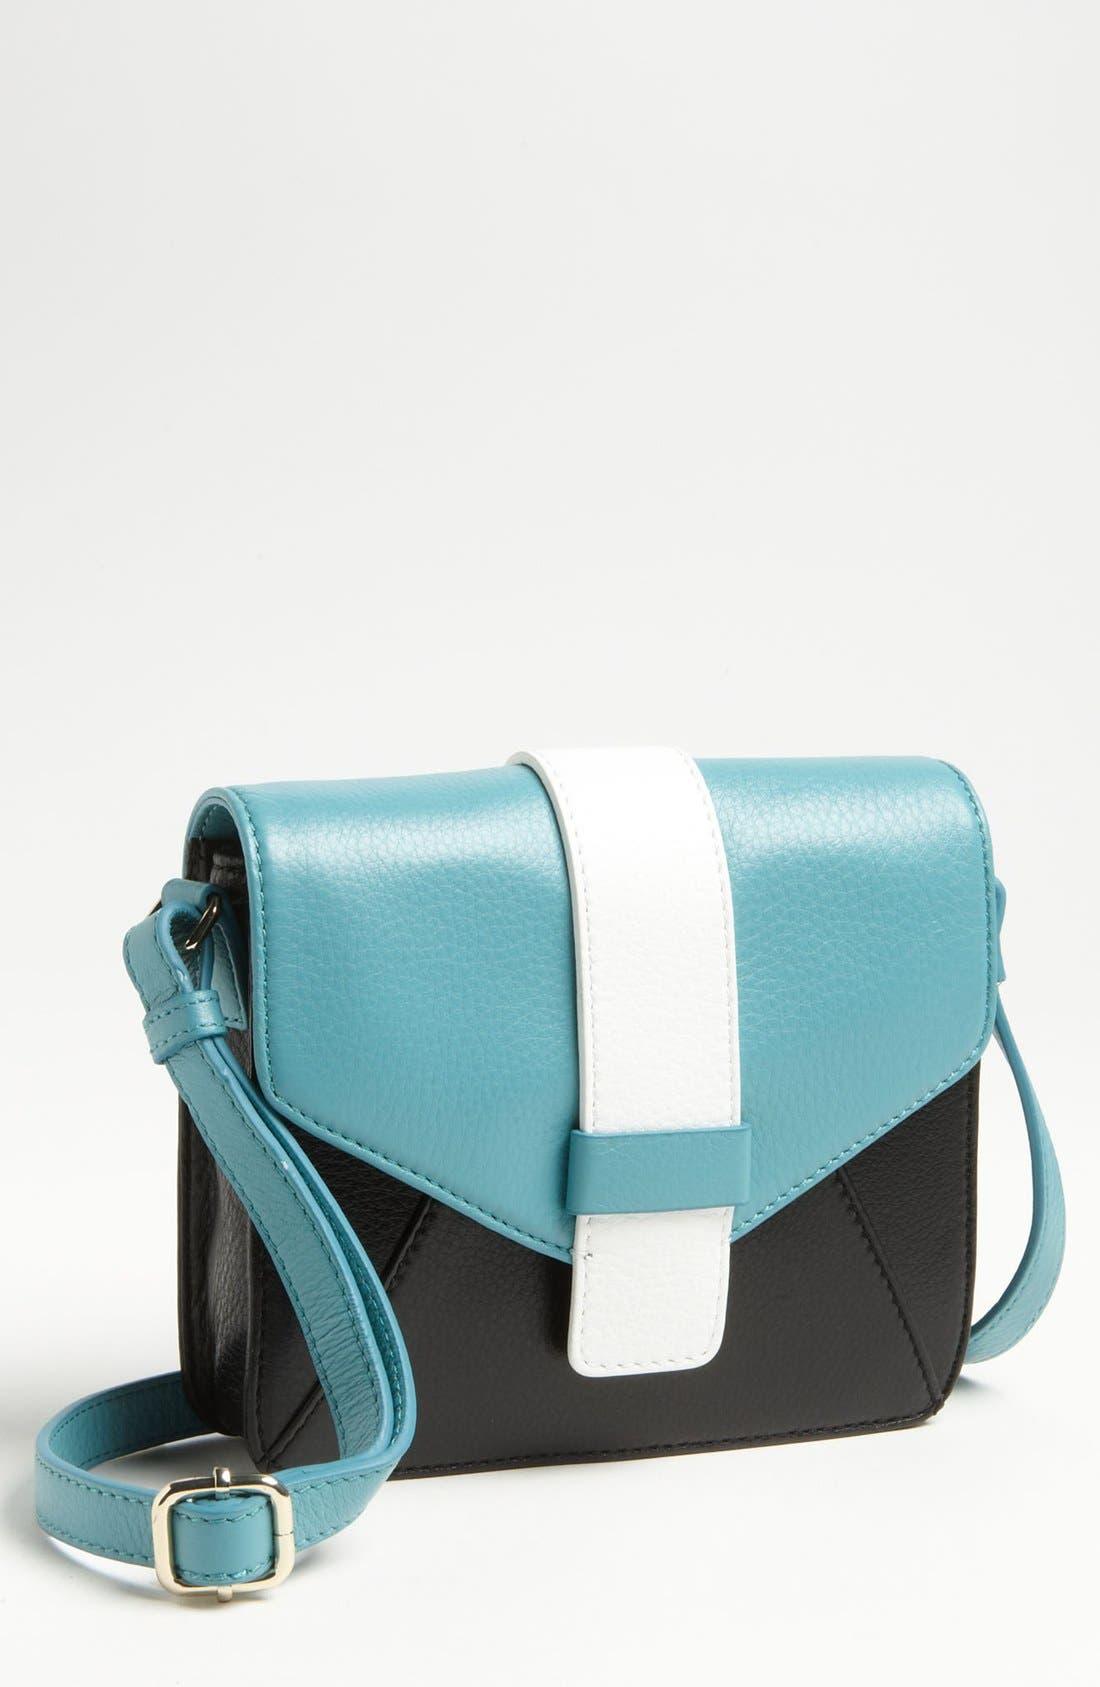 Alternate Image 1 Selected - Halogen 'Ella' Colorblock Crossbody Bag